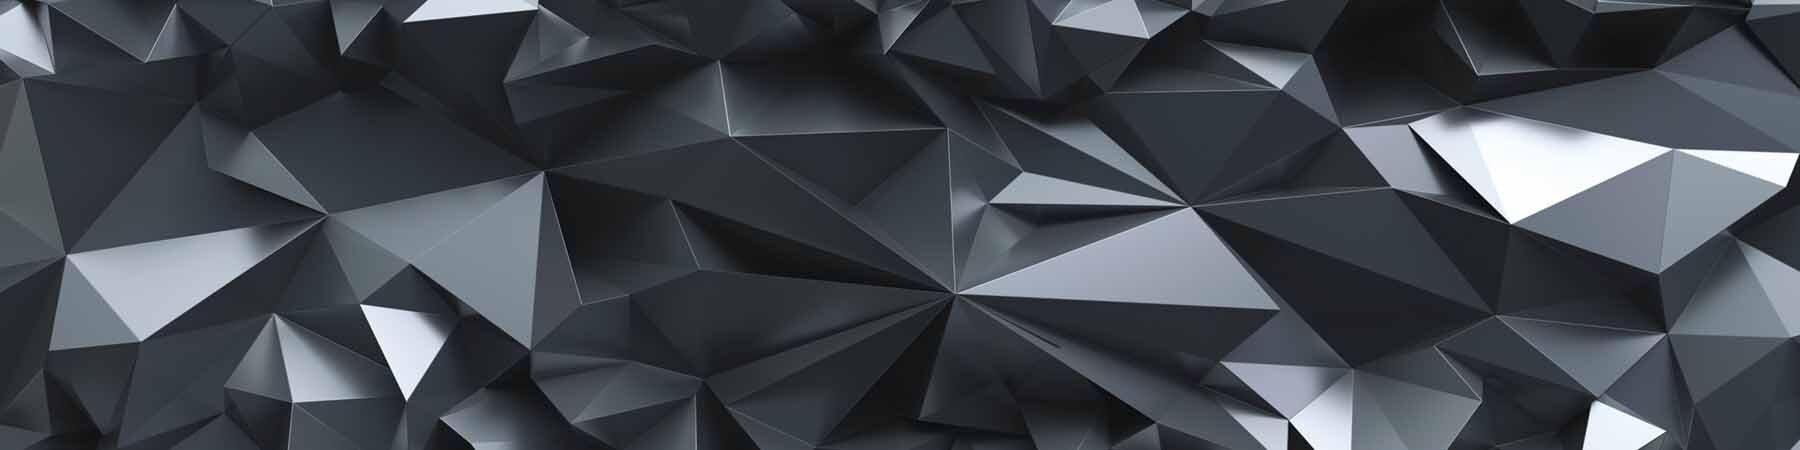 PlateART Küchenrückwand mit Motiv Kristall Schwarz